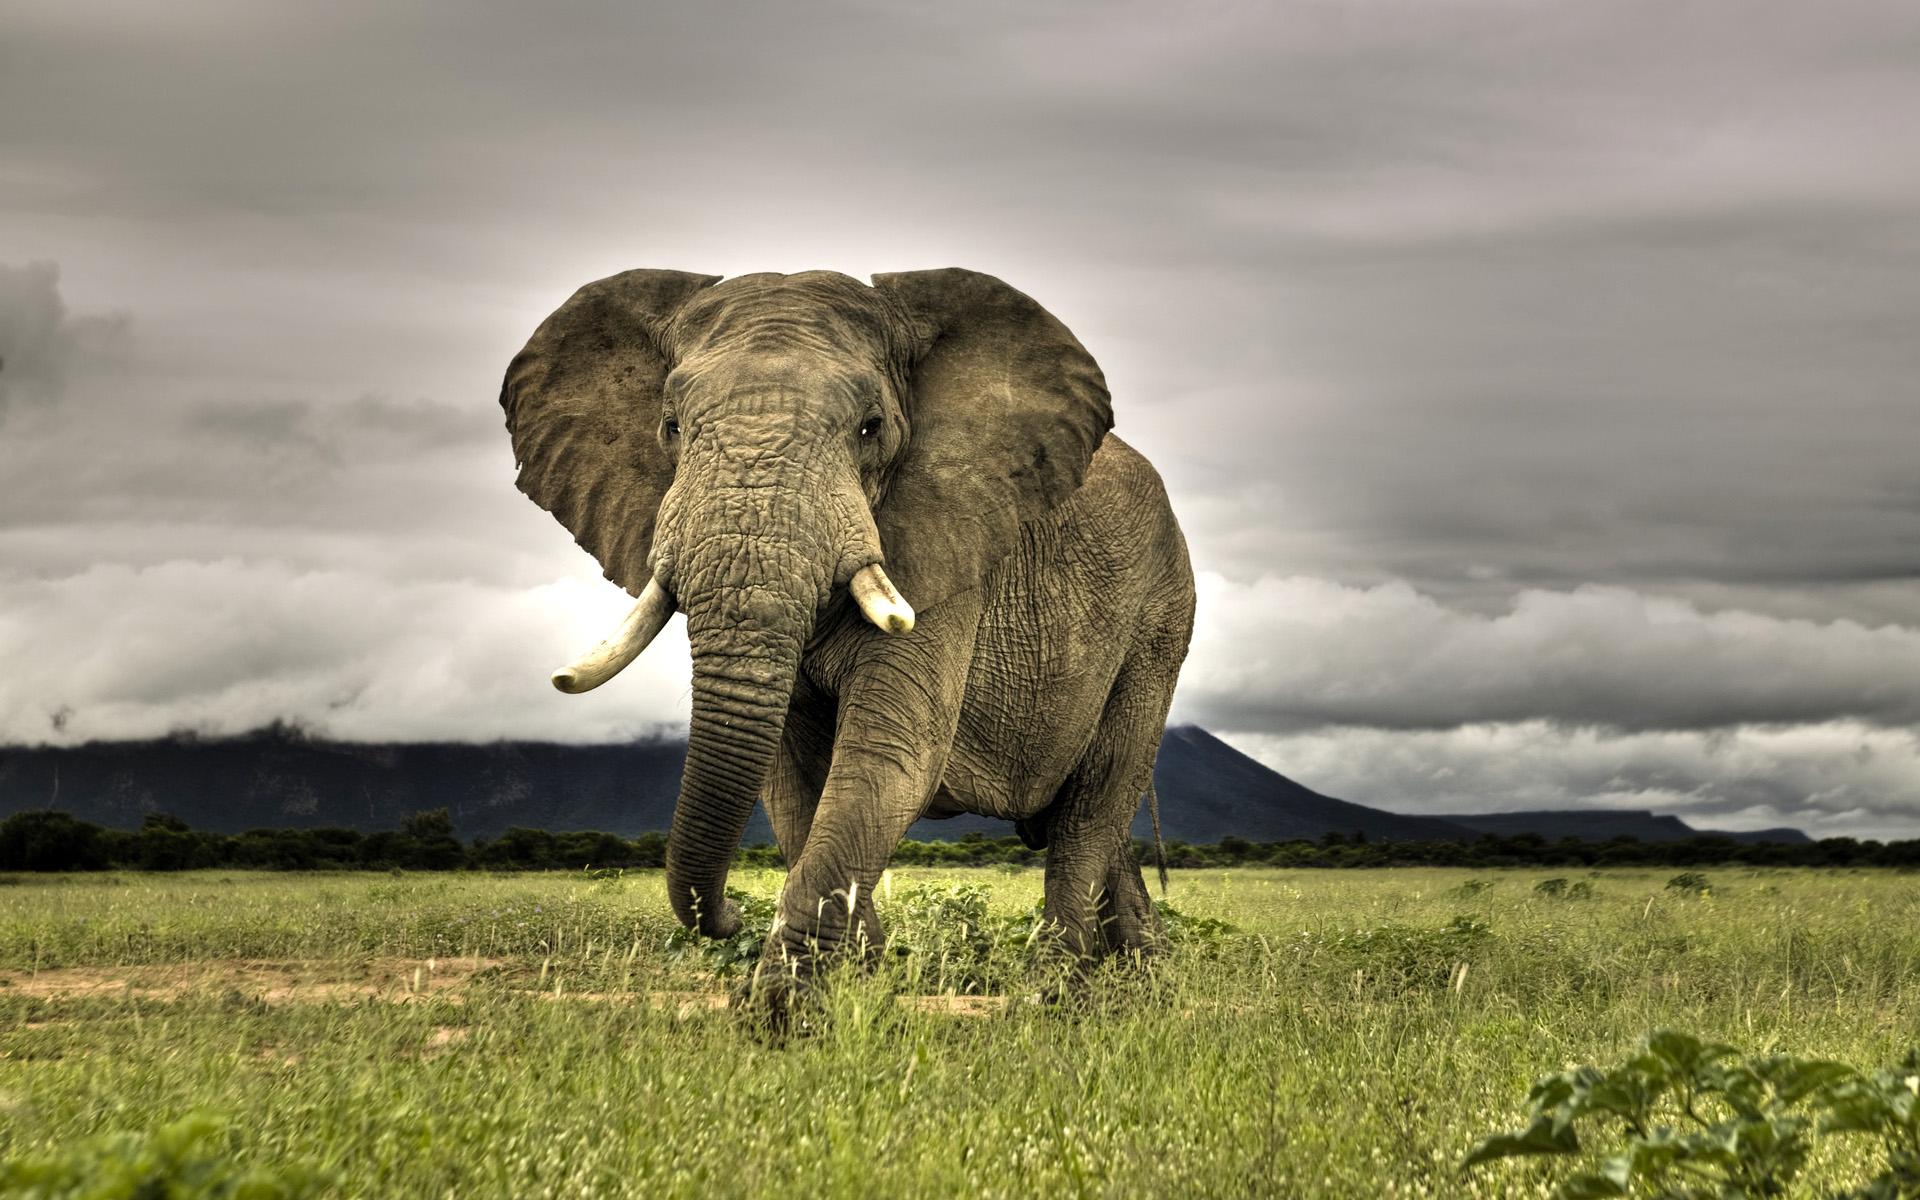 elephants wallpapers world - photo #5